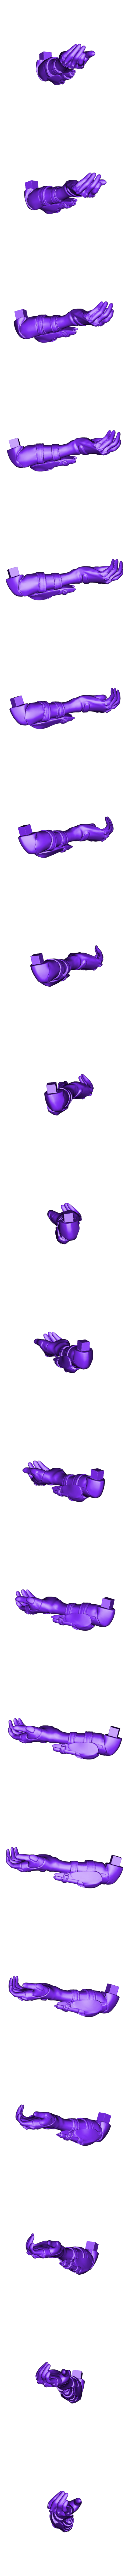 Arm_L.stl Download free STL file Ana Amari - Overwatch • 3D print template, Frazus